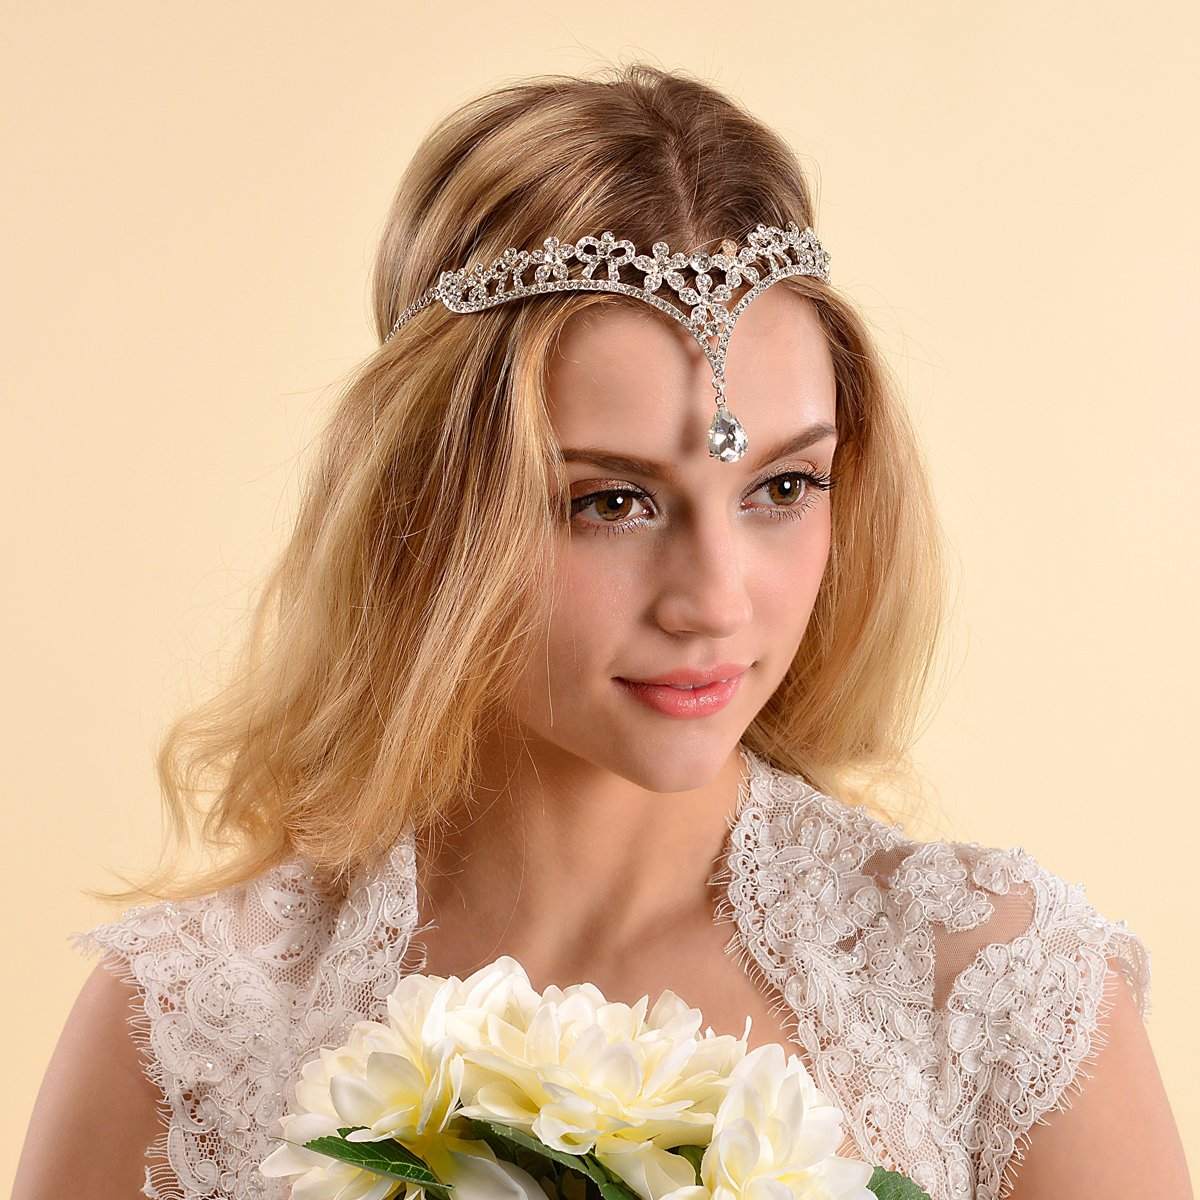 Remedios Crystal Sweet Wedding Tiara Bridal Headband forehead Chain Headpiece, Silver